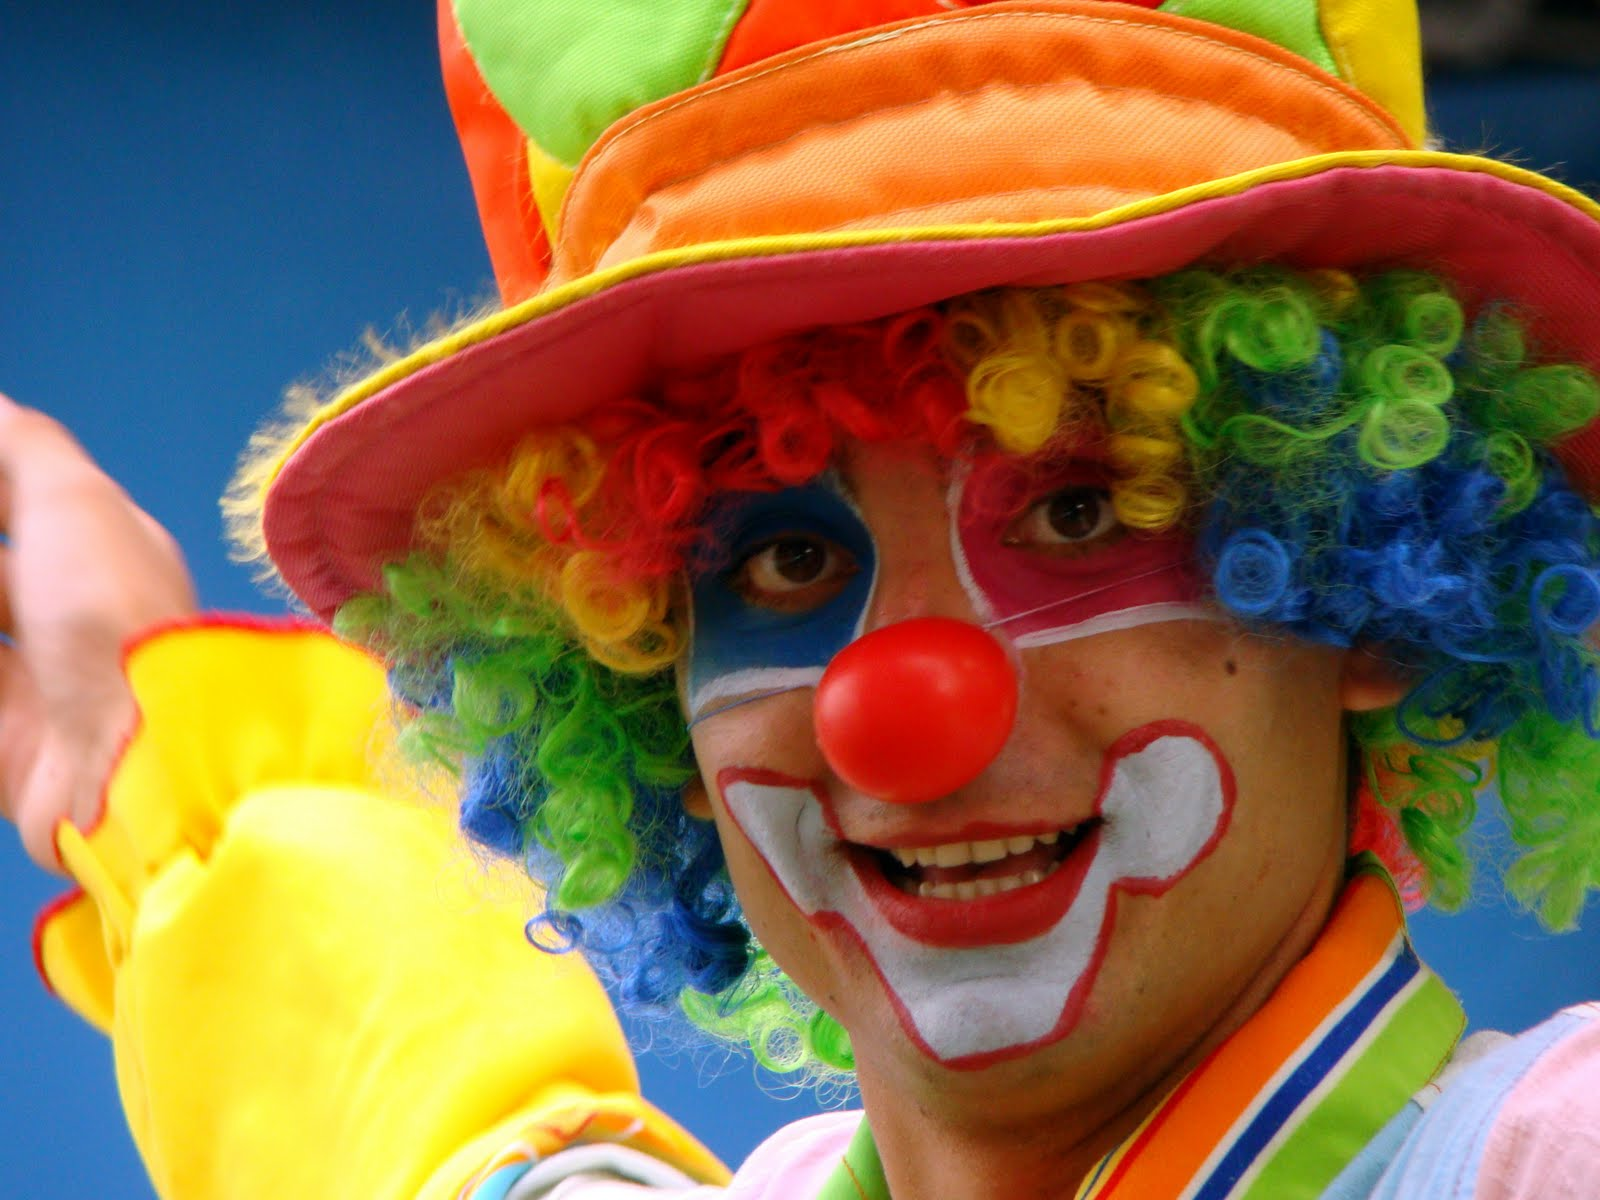 happy clown faces pictures - HD1600×1200